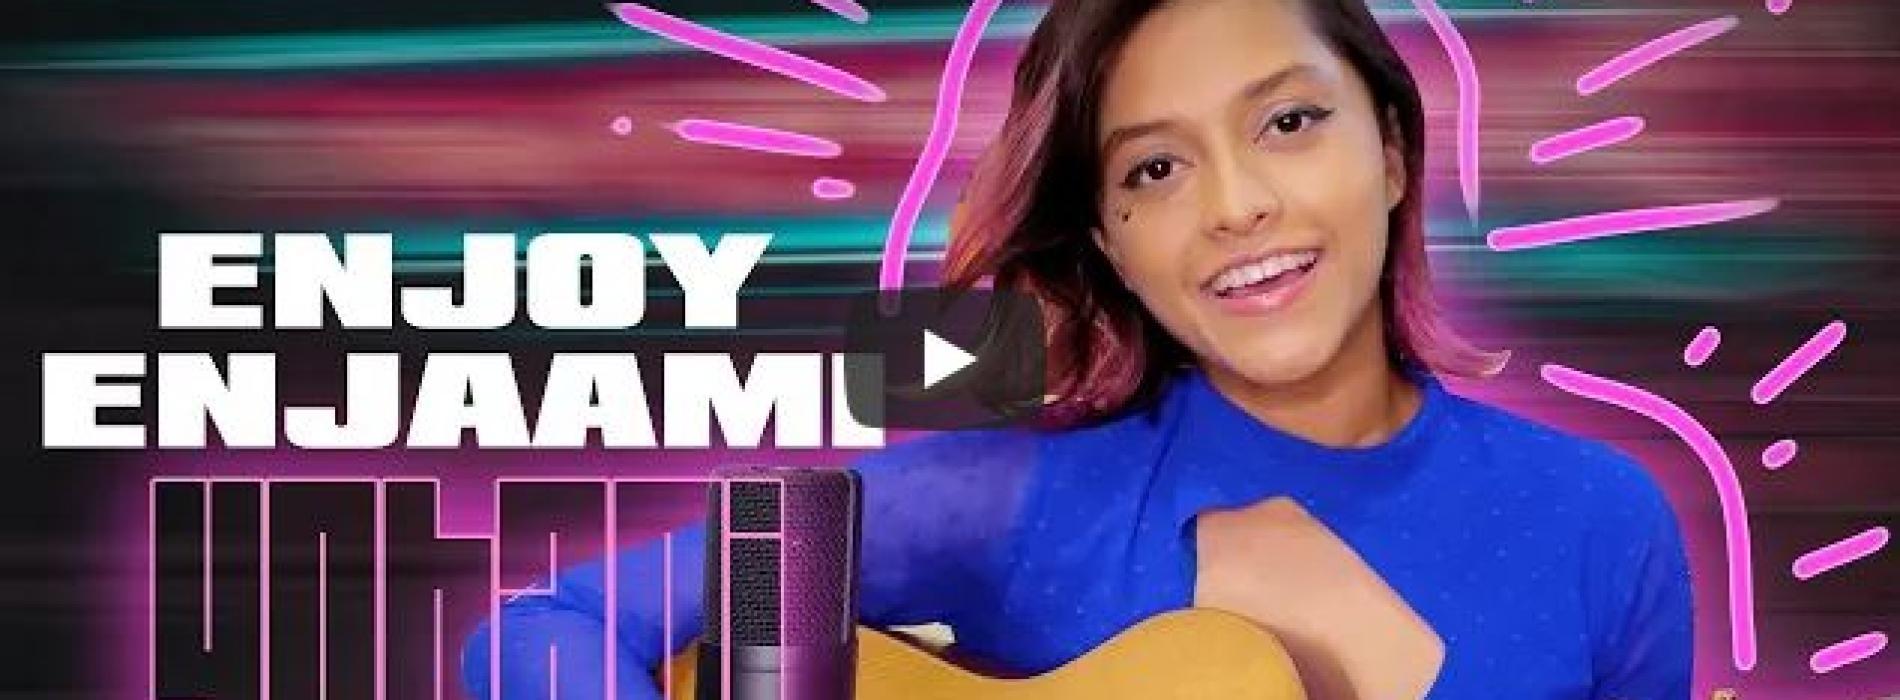 New Music : Yohani – Enjoy Enjaami (Dhee ft Arivu ) – Cover (Home Recording)